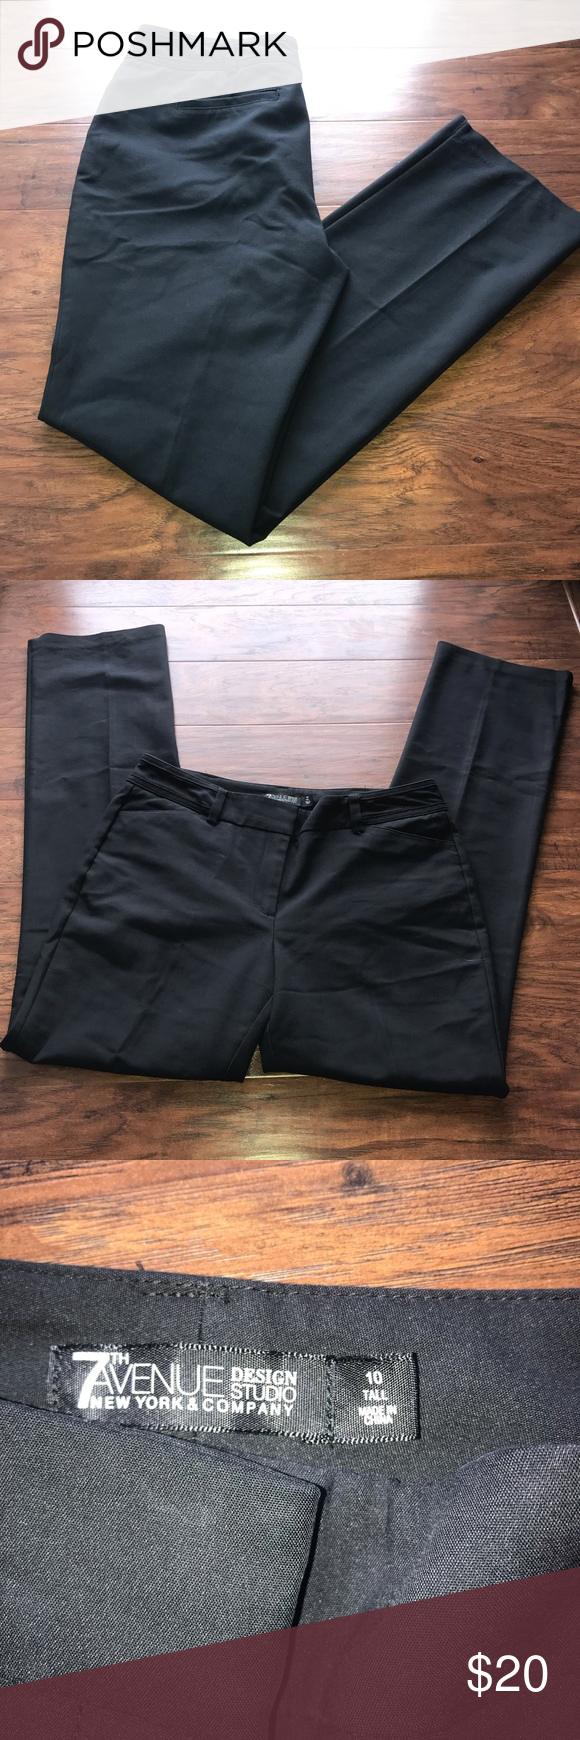 2 30 New York Company Size 10 Tall Dress Pants New York Company Dress Pants Clothes Design [ 1740 x 580 Pixel ]